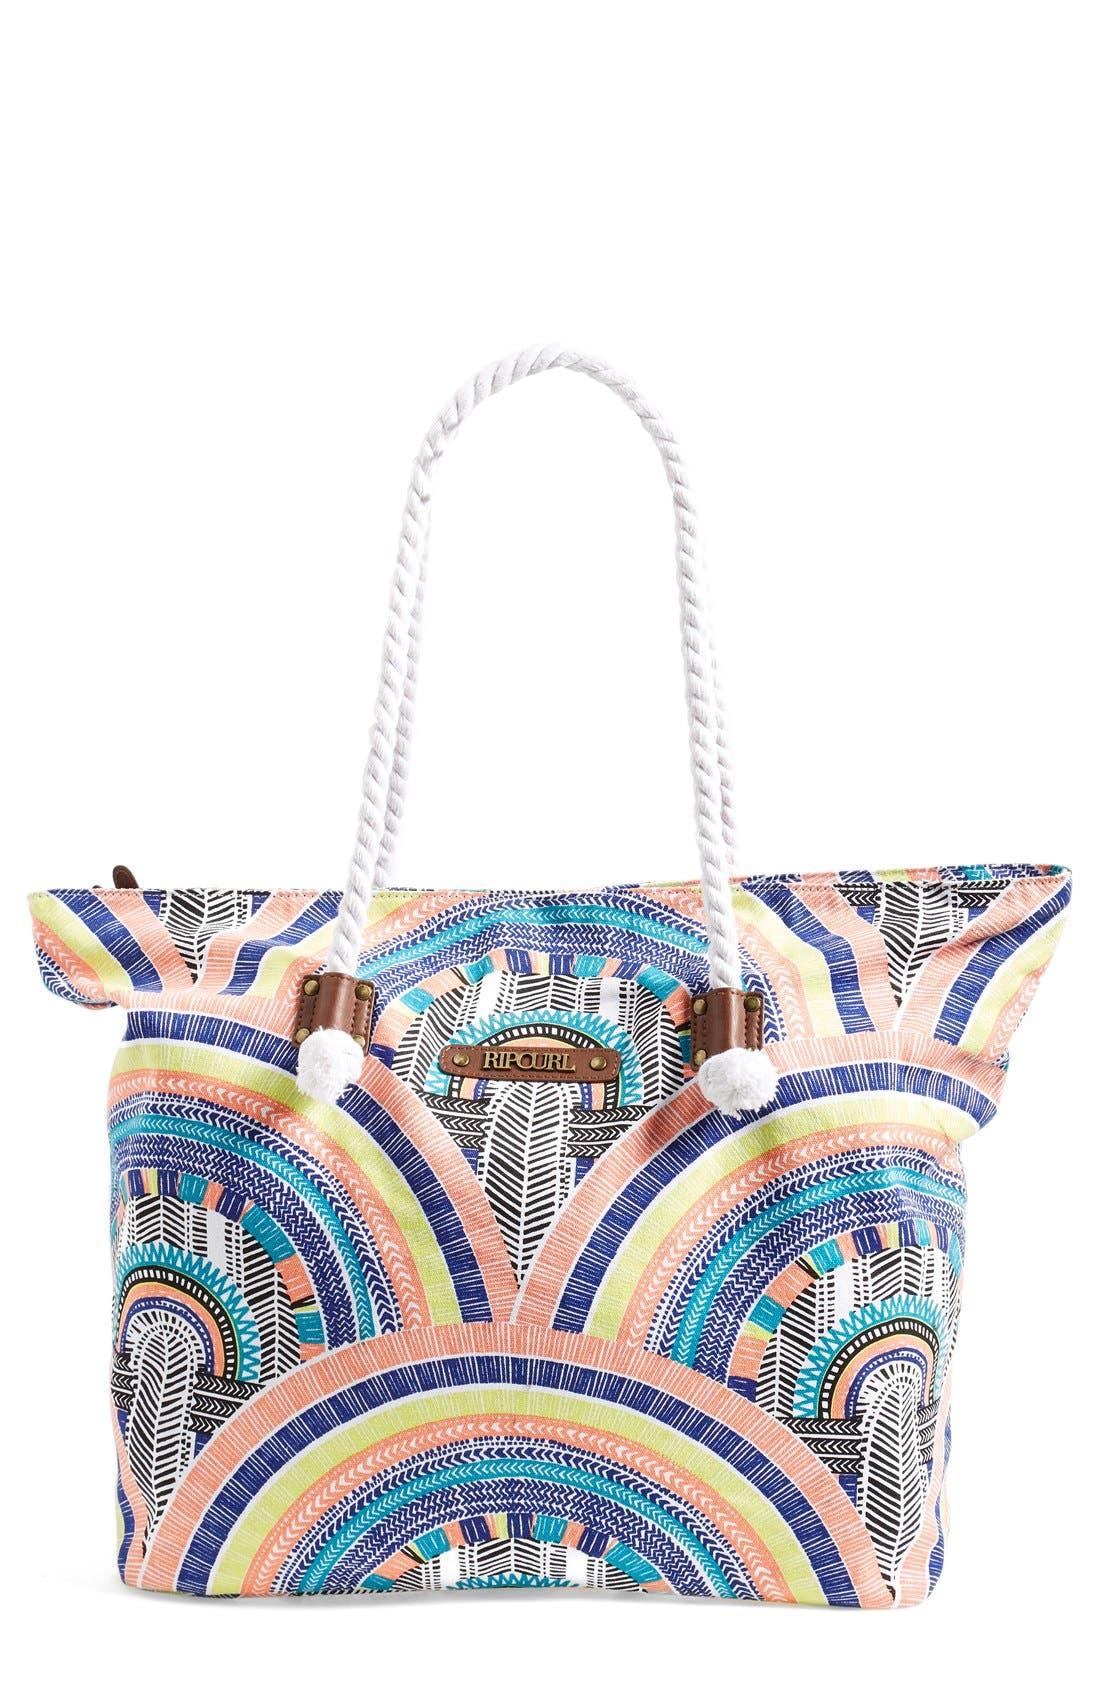 Main Image - Rip Curl 'Modern Myth' Beach Bag